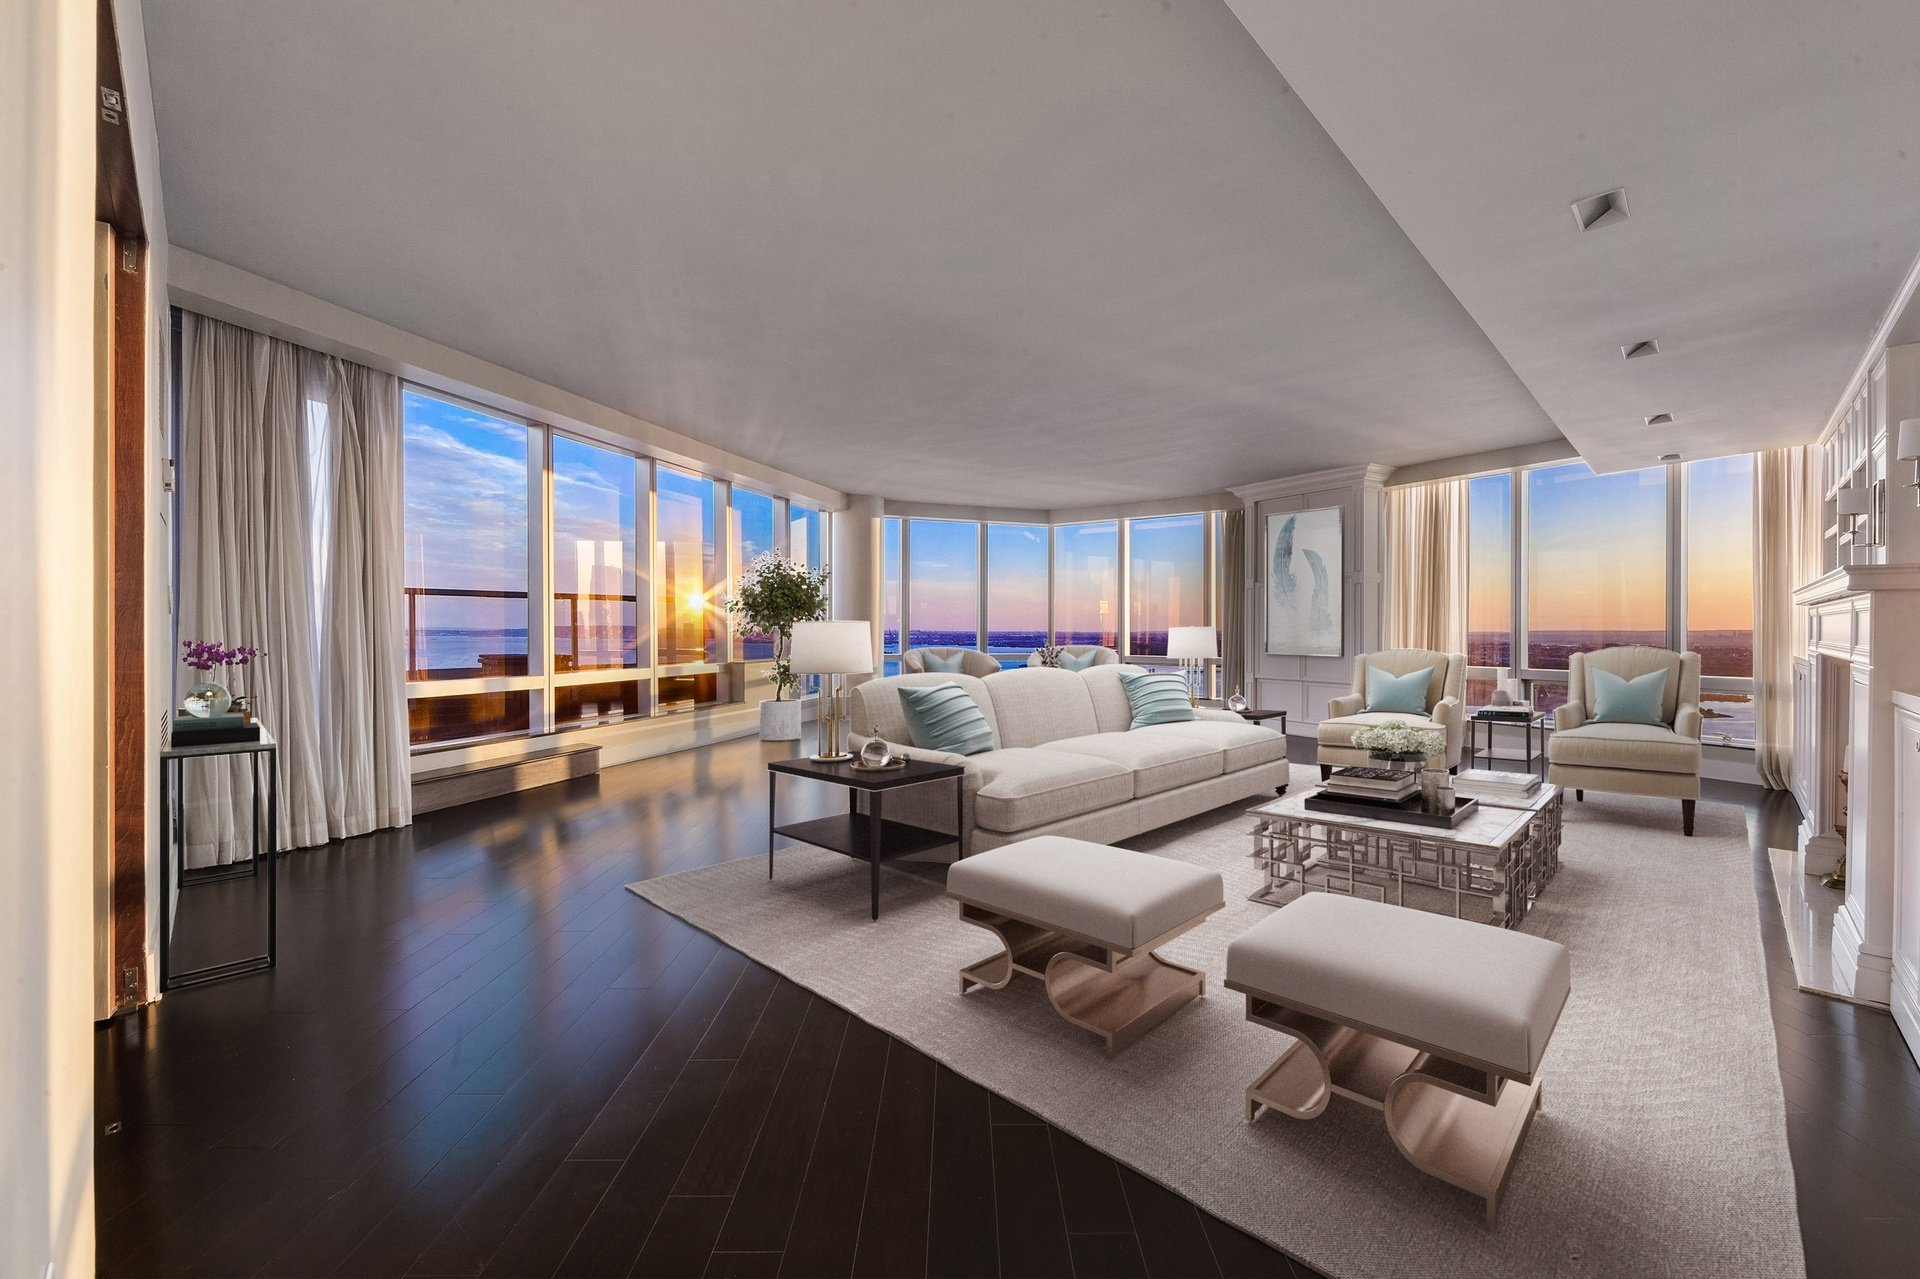 Condo in Manhattan, New York, United States 1